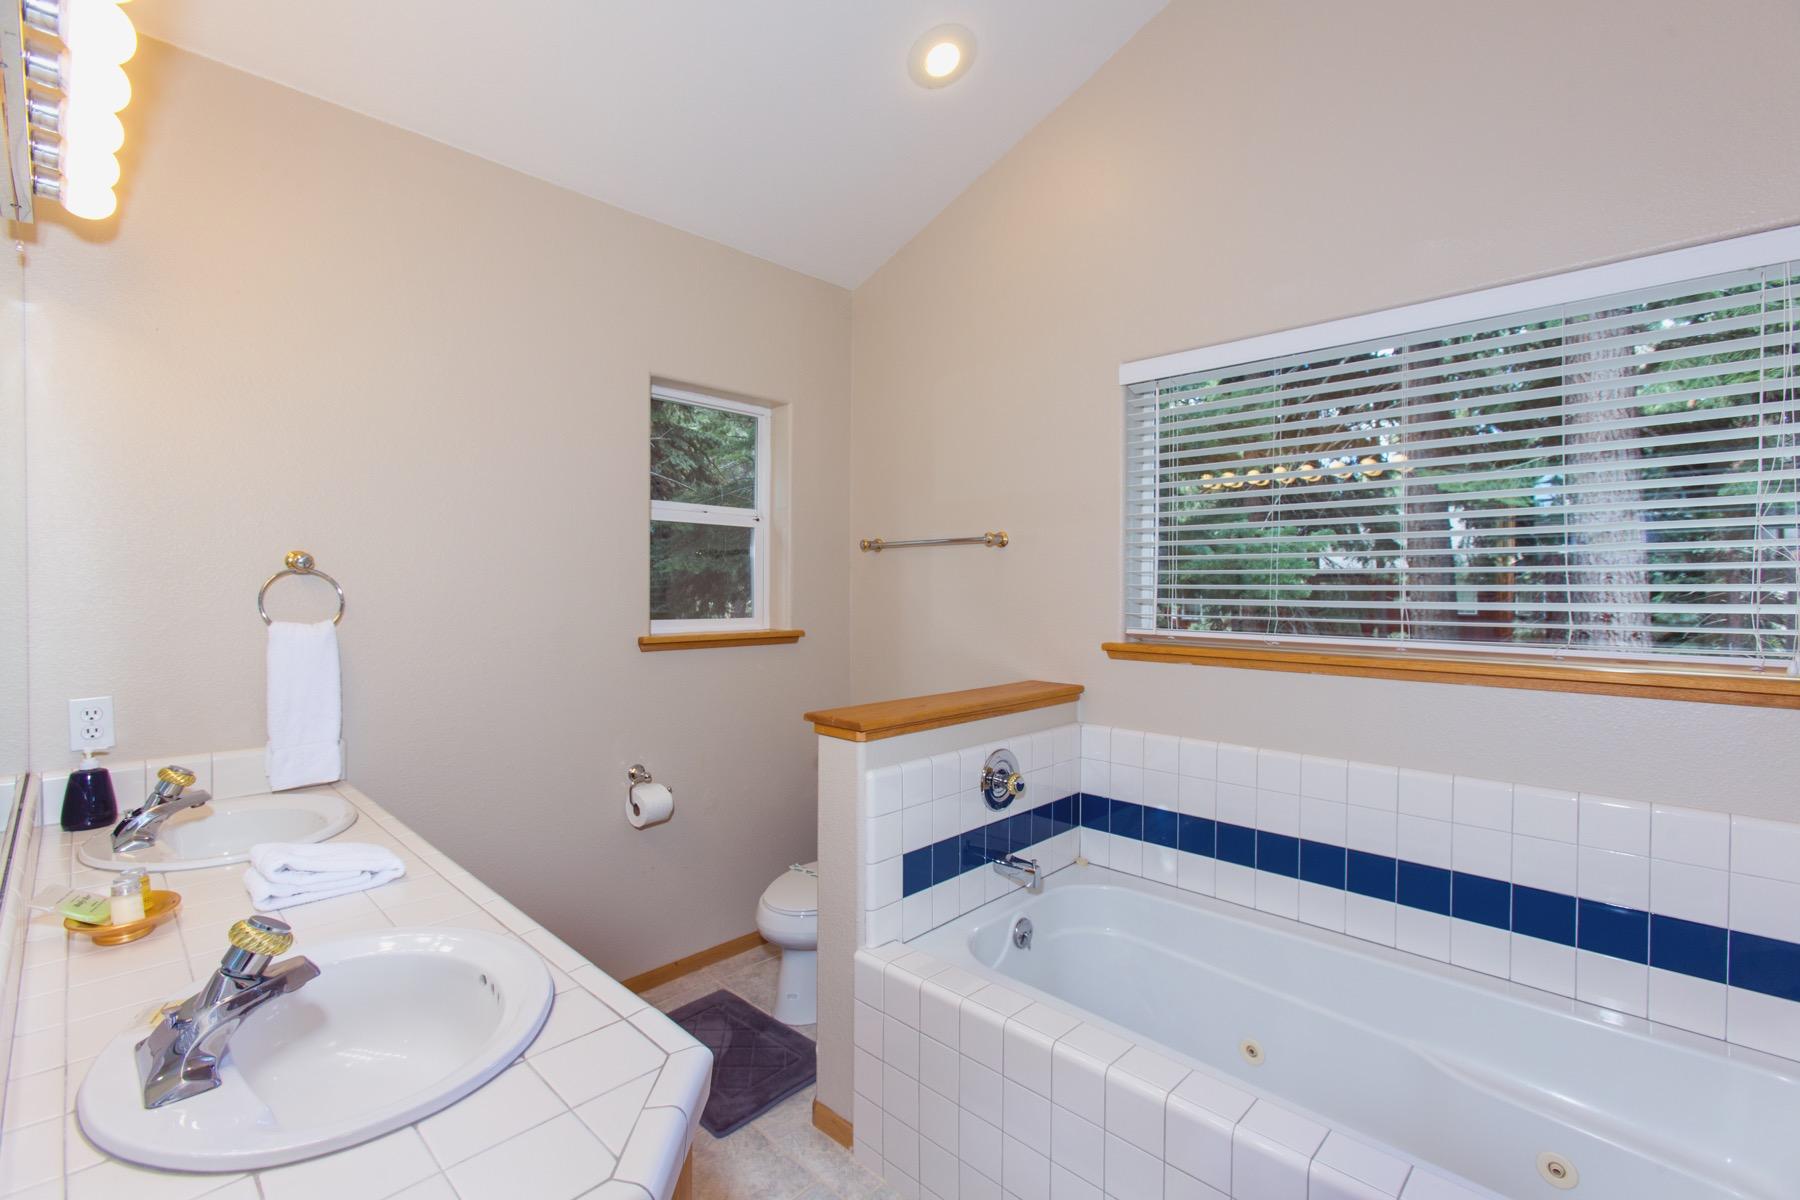 Take a bath in this bright bathroom.